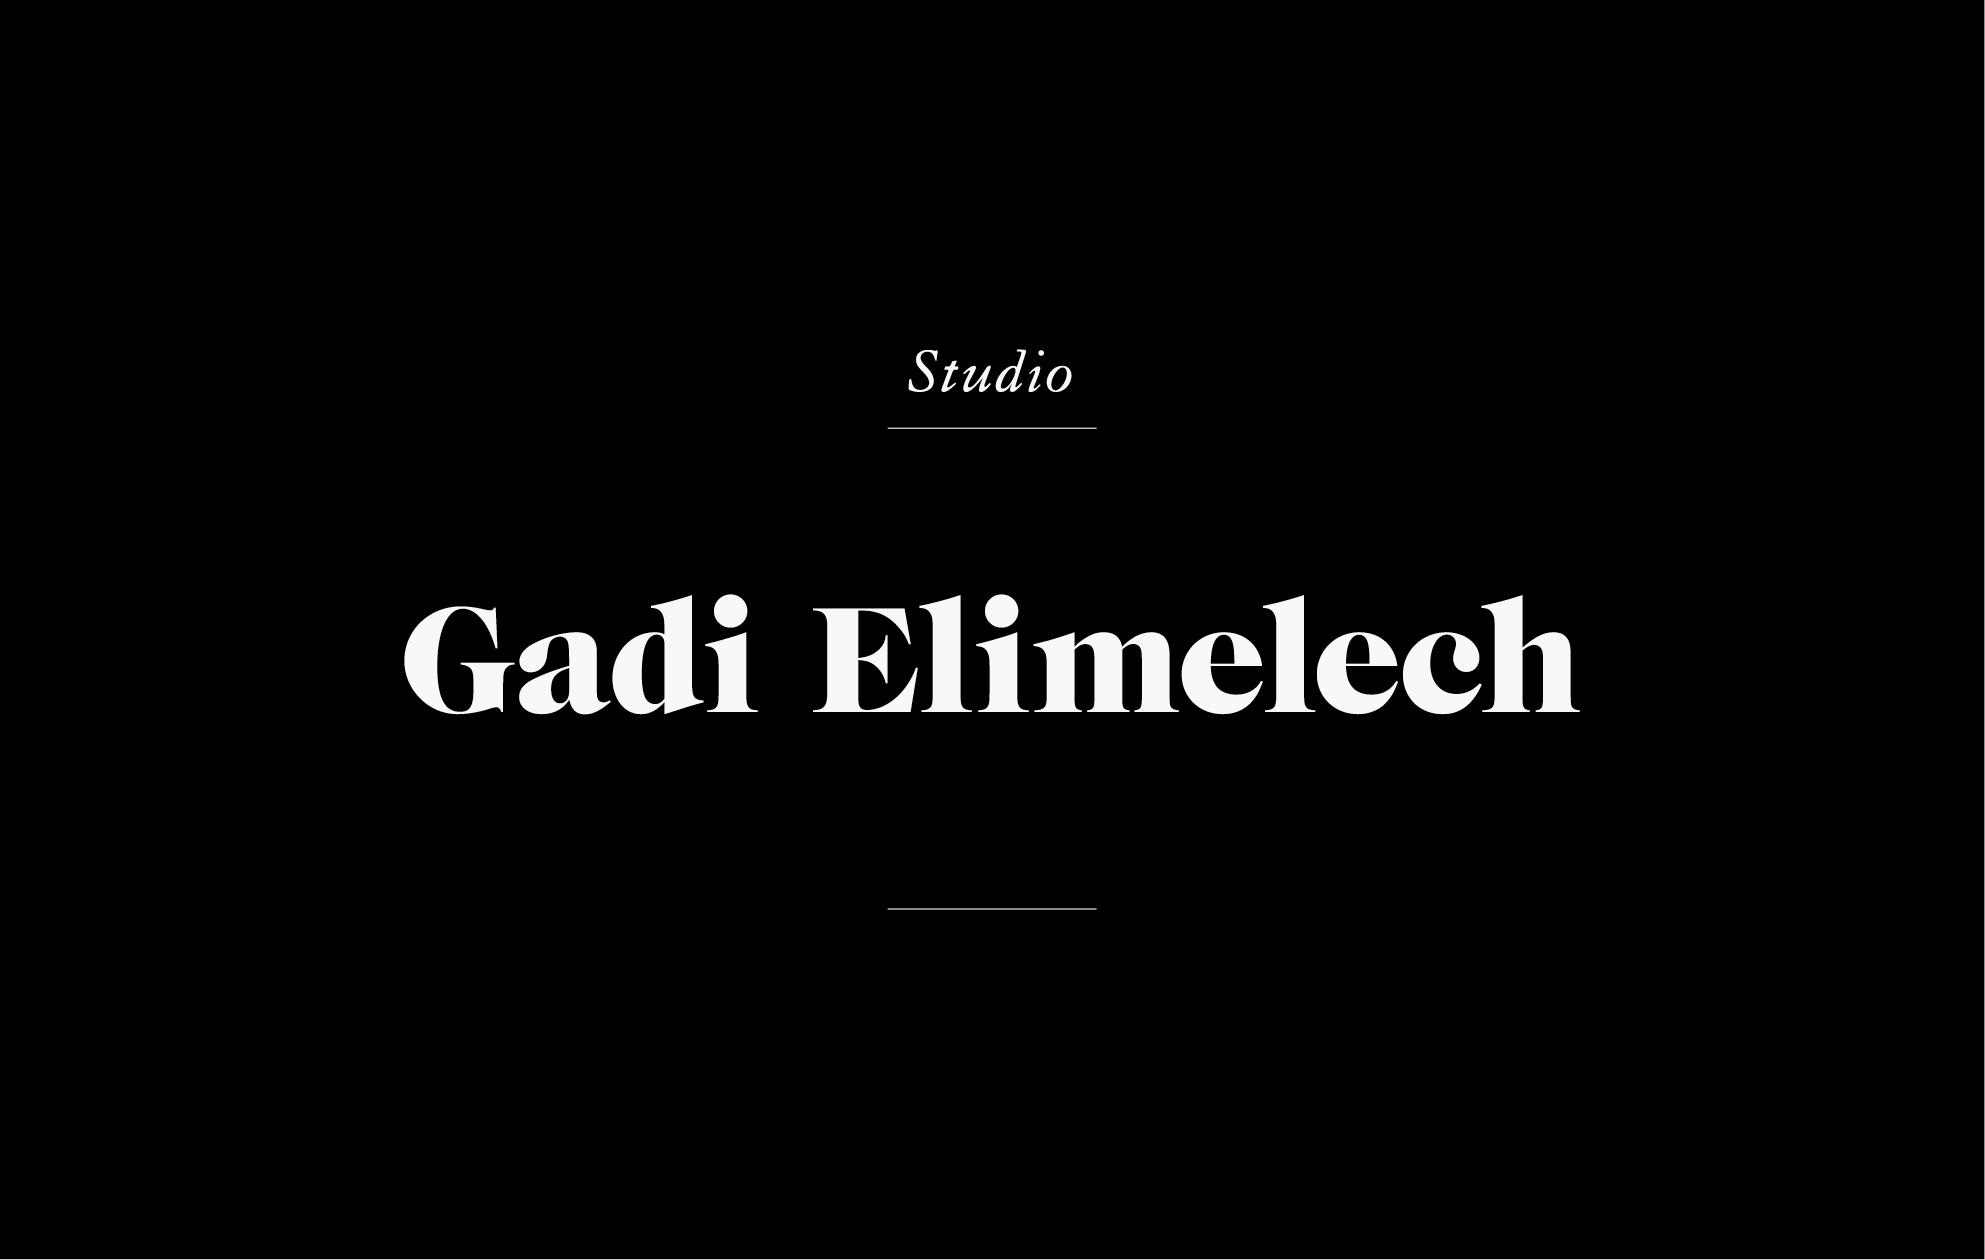 GADI ELIMELECH STUDIO